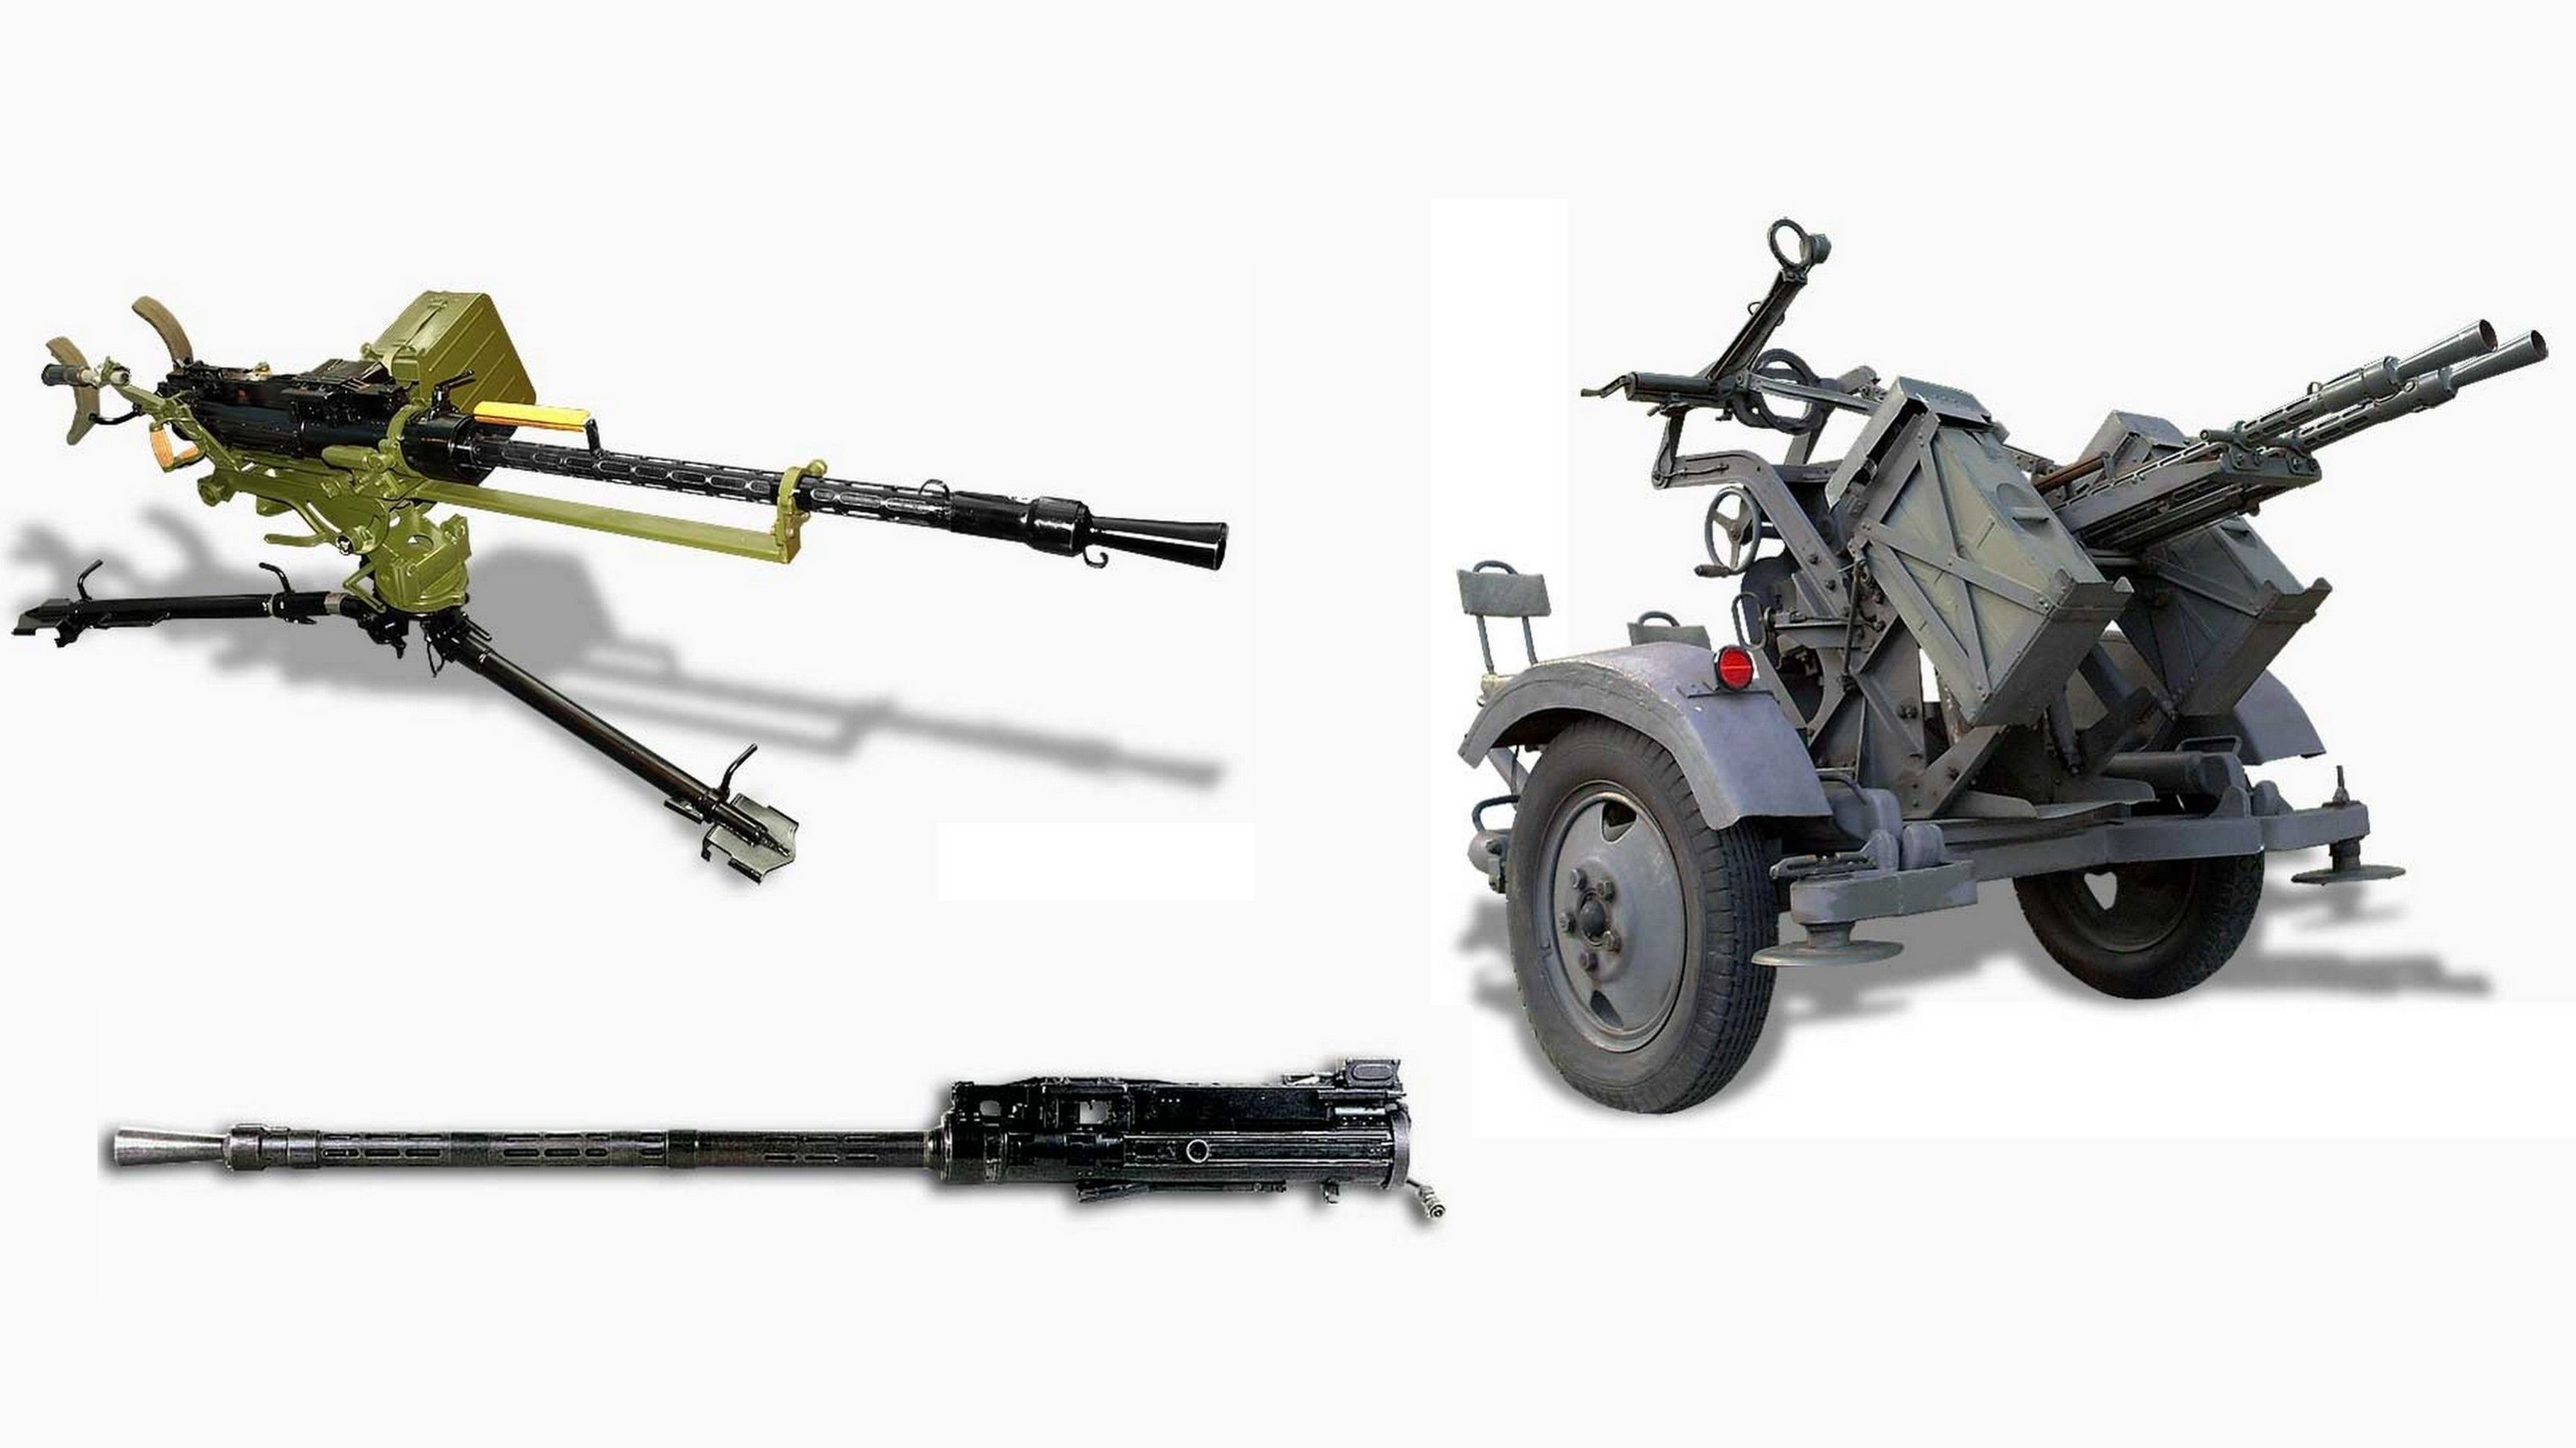 кпвт пулемет характеристики фото можно научиться